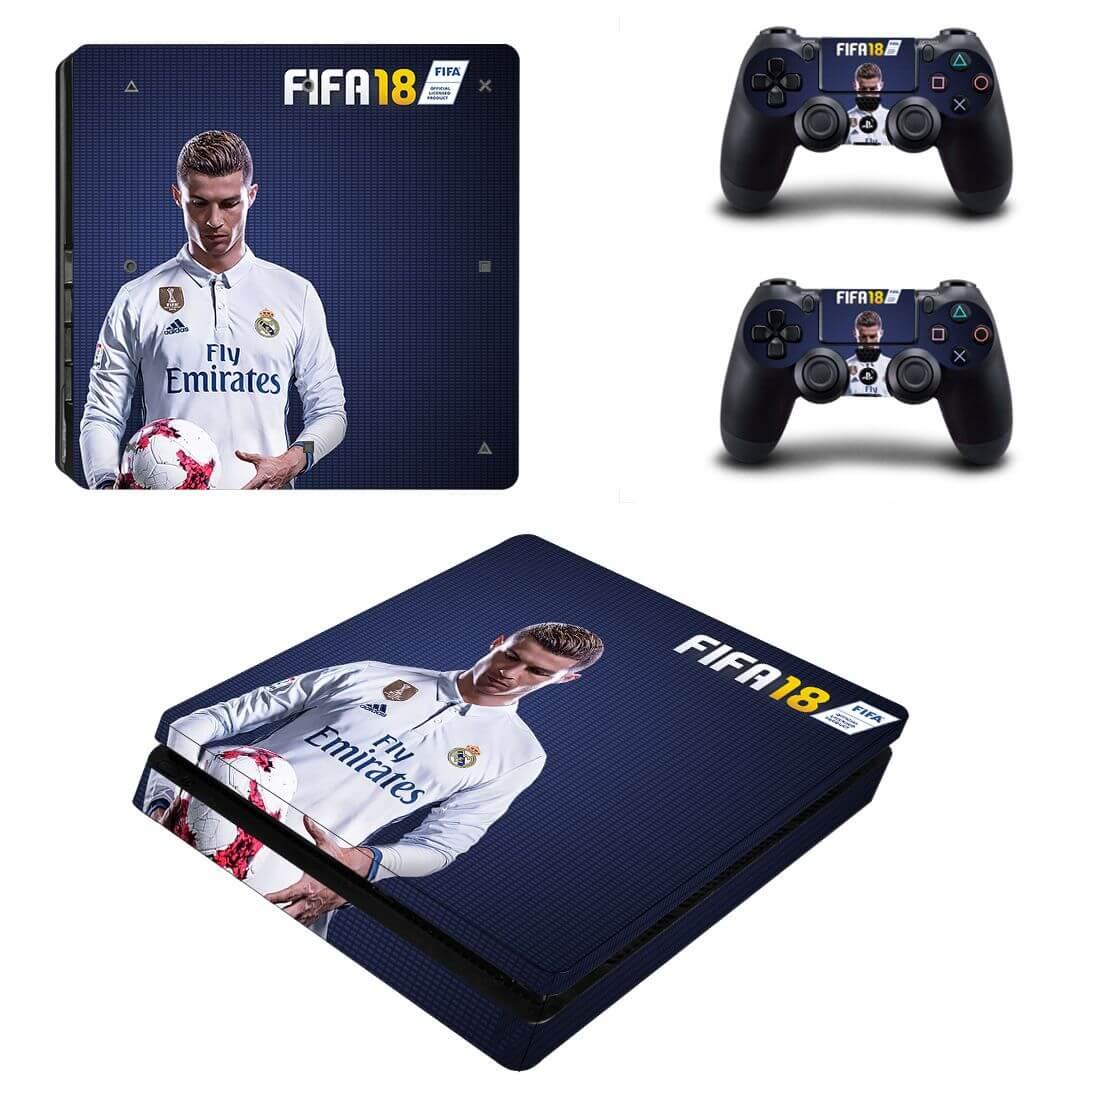 FIFA 18 Ronaldo PS4 Slim skin